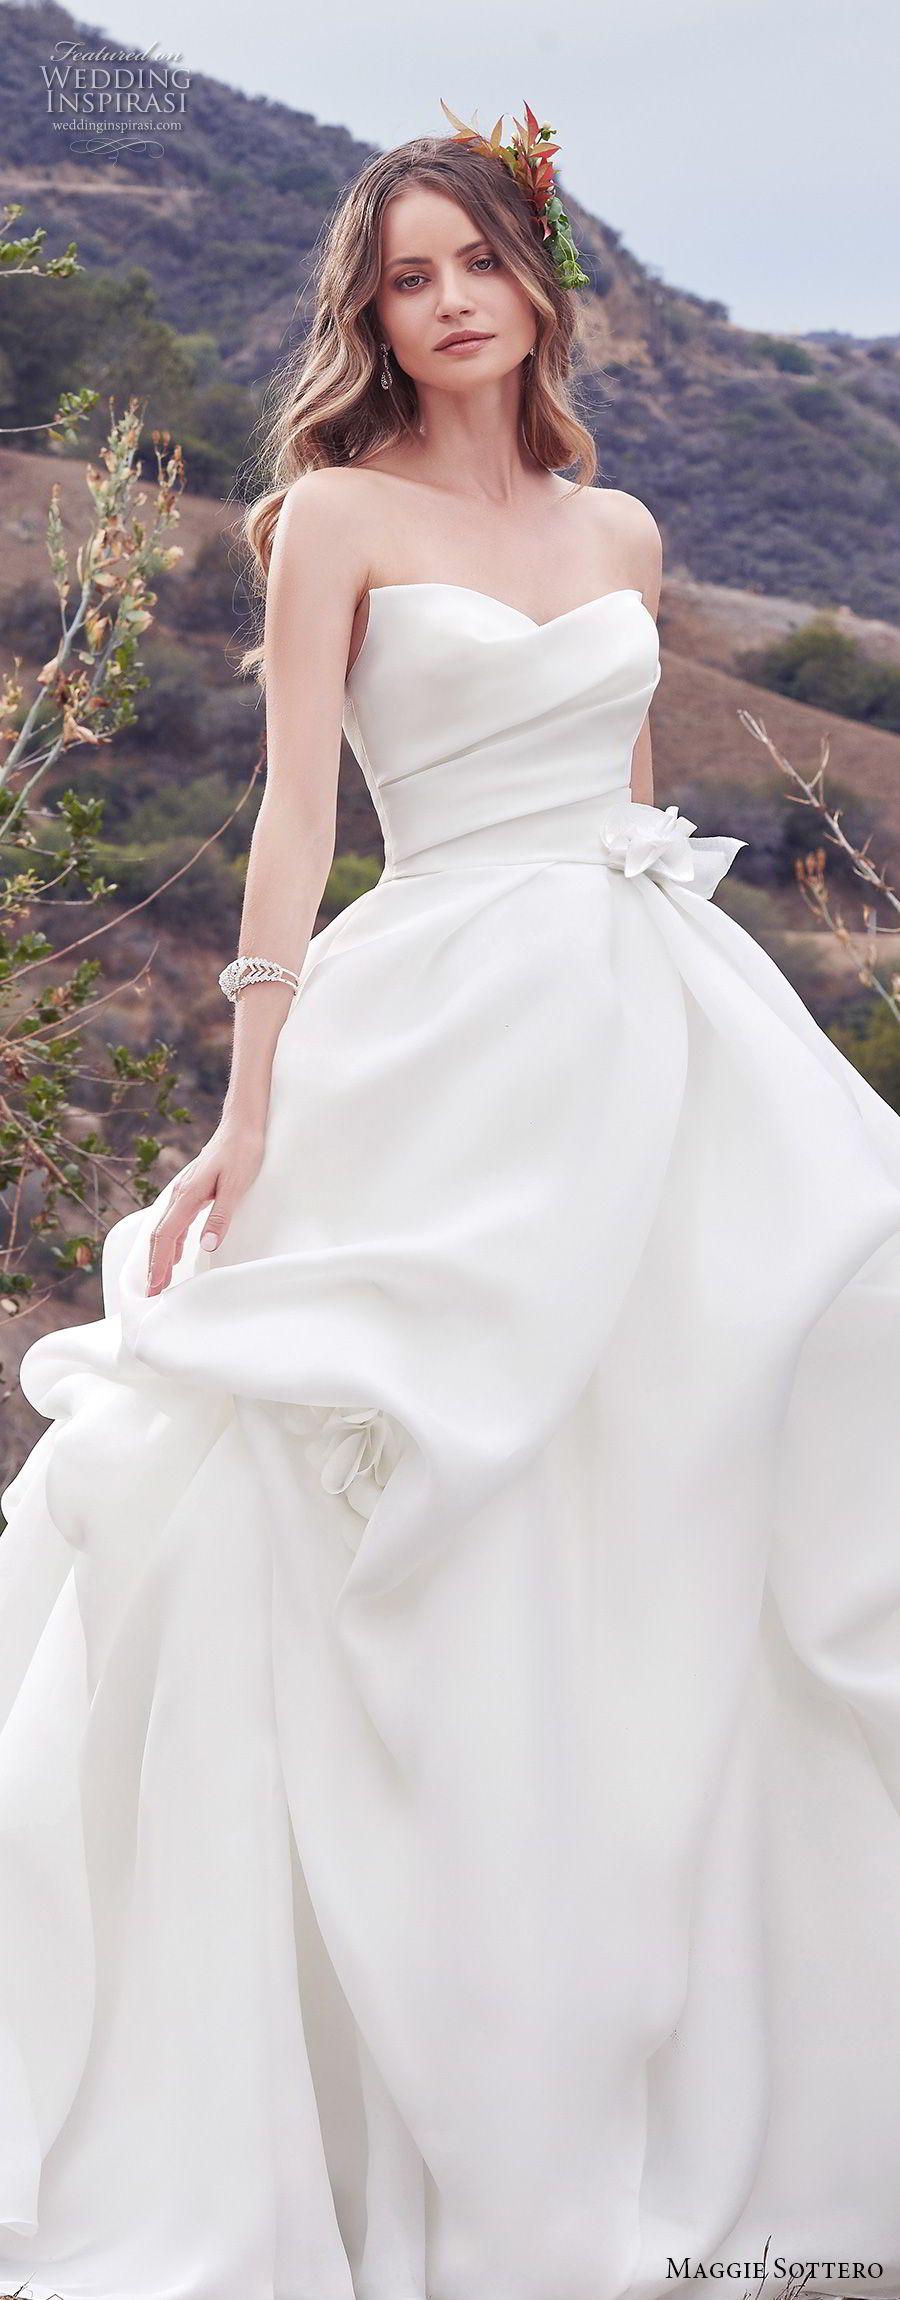 Maggie sottero fall wedding dresses u uccordeliaud bridal